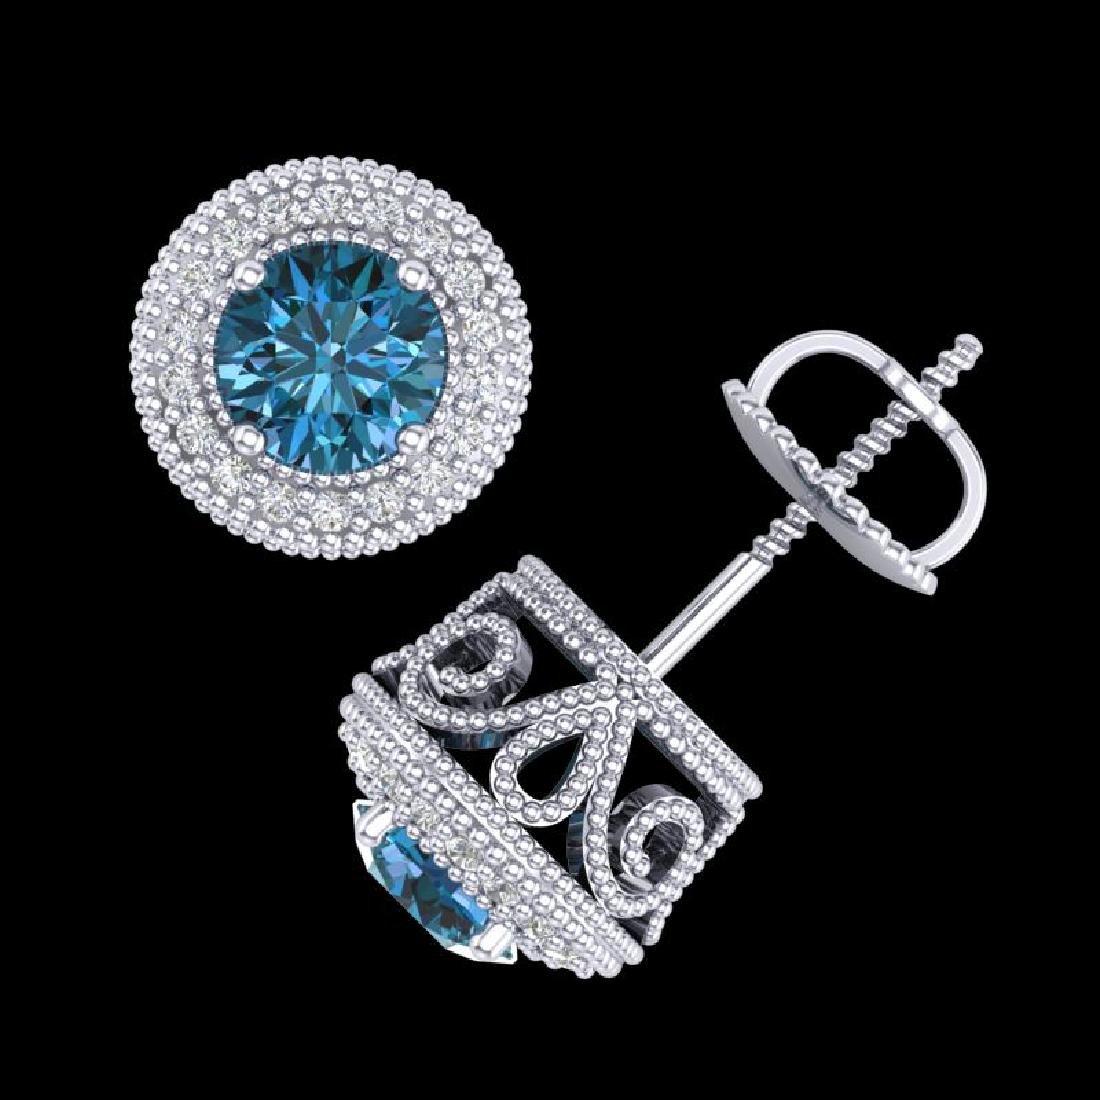 1.55 CTW Fancy Intense Blue Diamond Art Deco Stud - 2